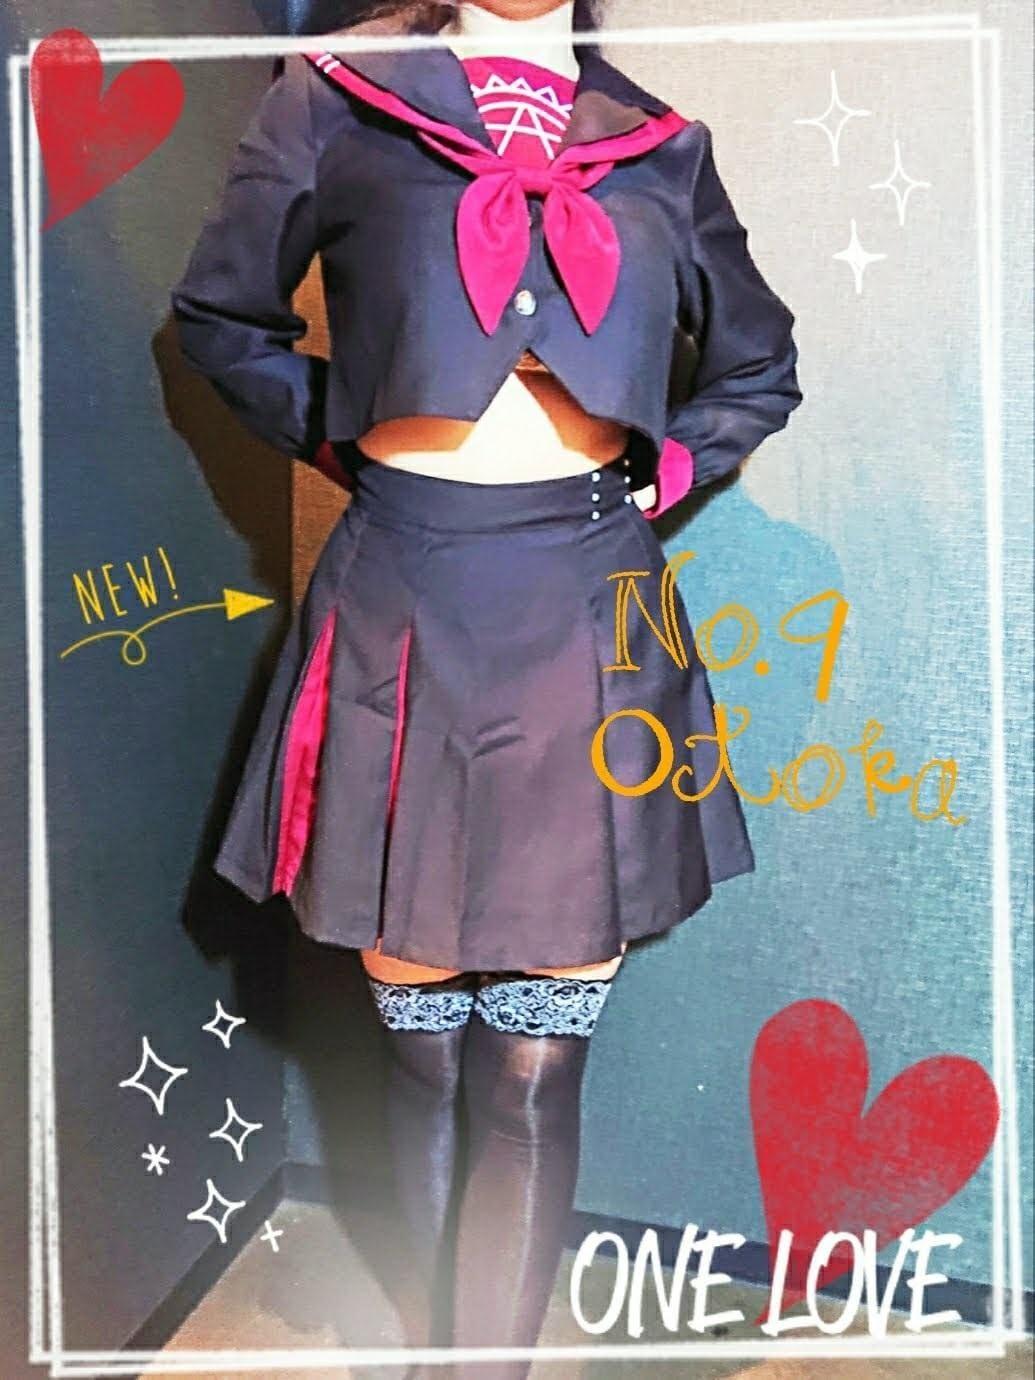 「☆Newセーラー服☆&GWの予定♪」04/26(04/26) 23:02 | おとかの写メ・風俗動画